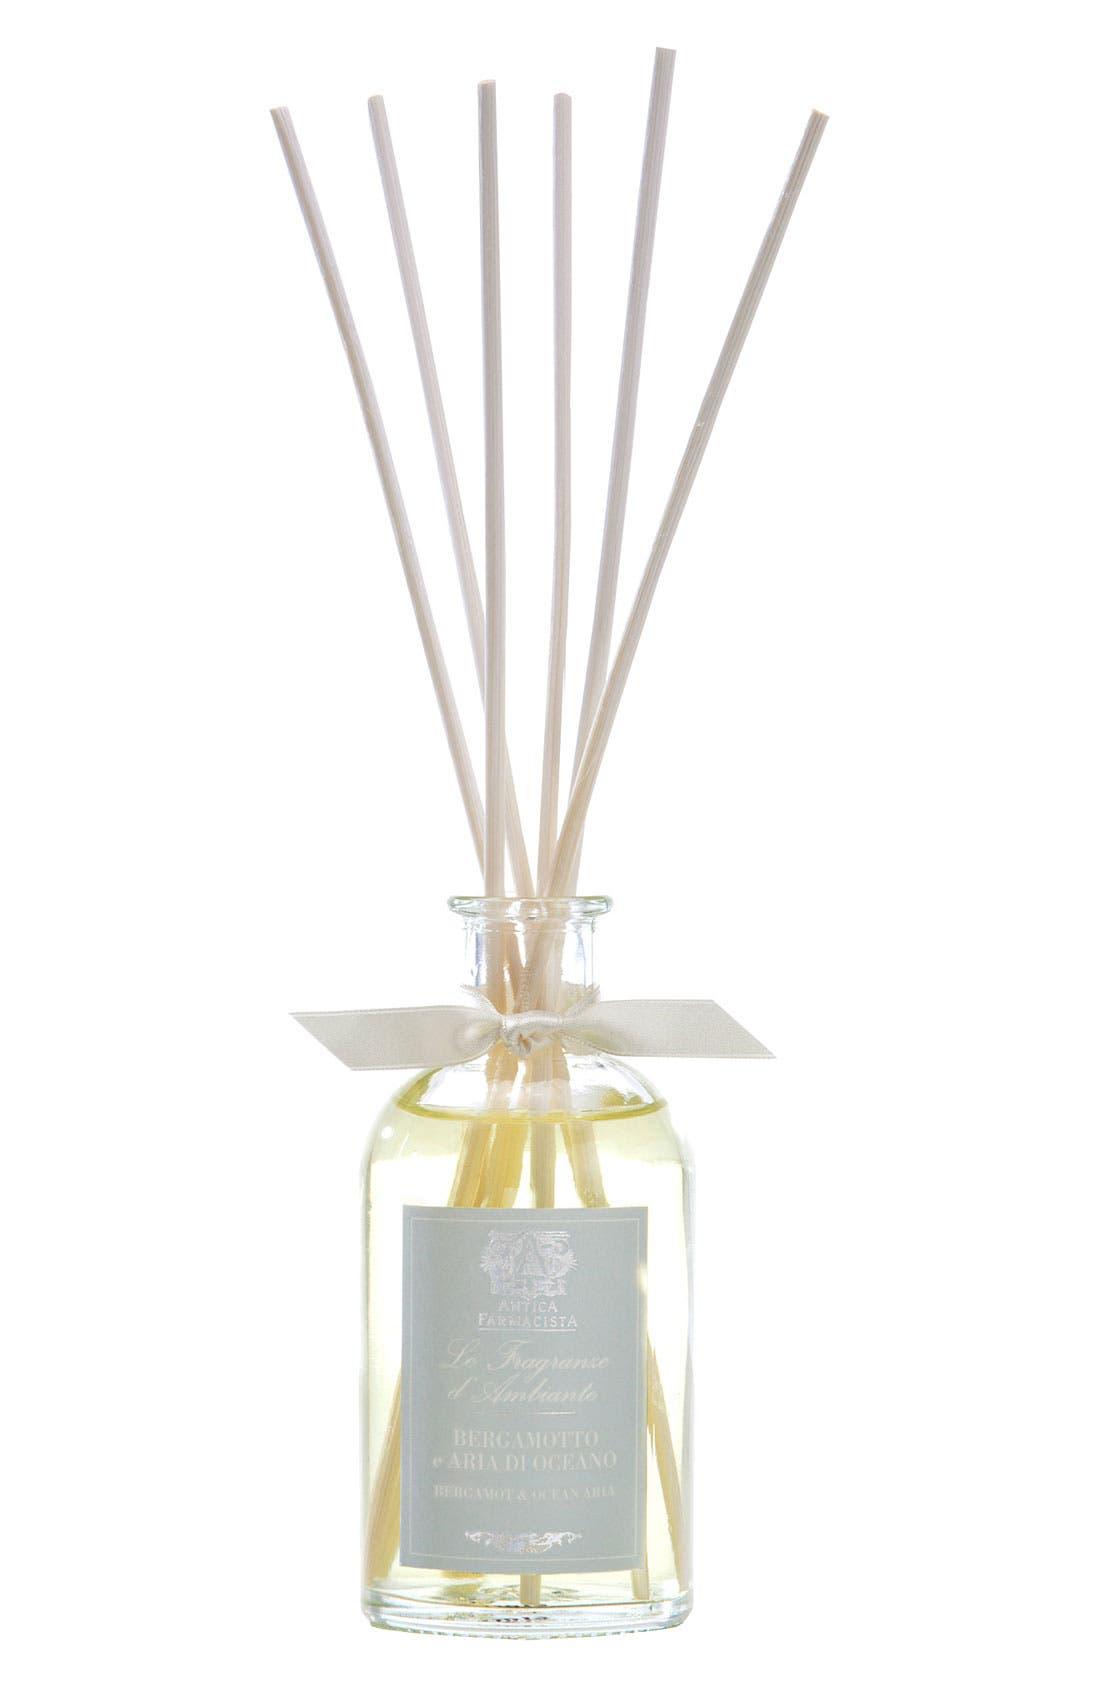 Bergamot & Ocean Aria Home Ambiance Perfume,                             Main thumbnail 1, color,                             No Color